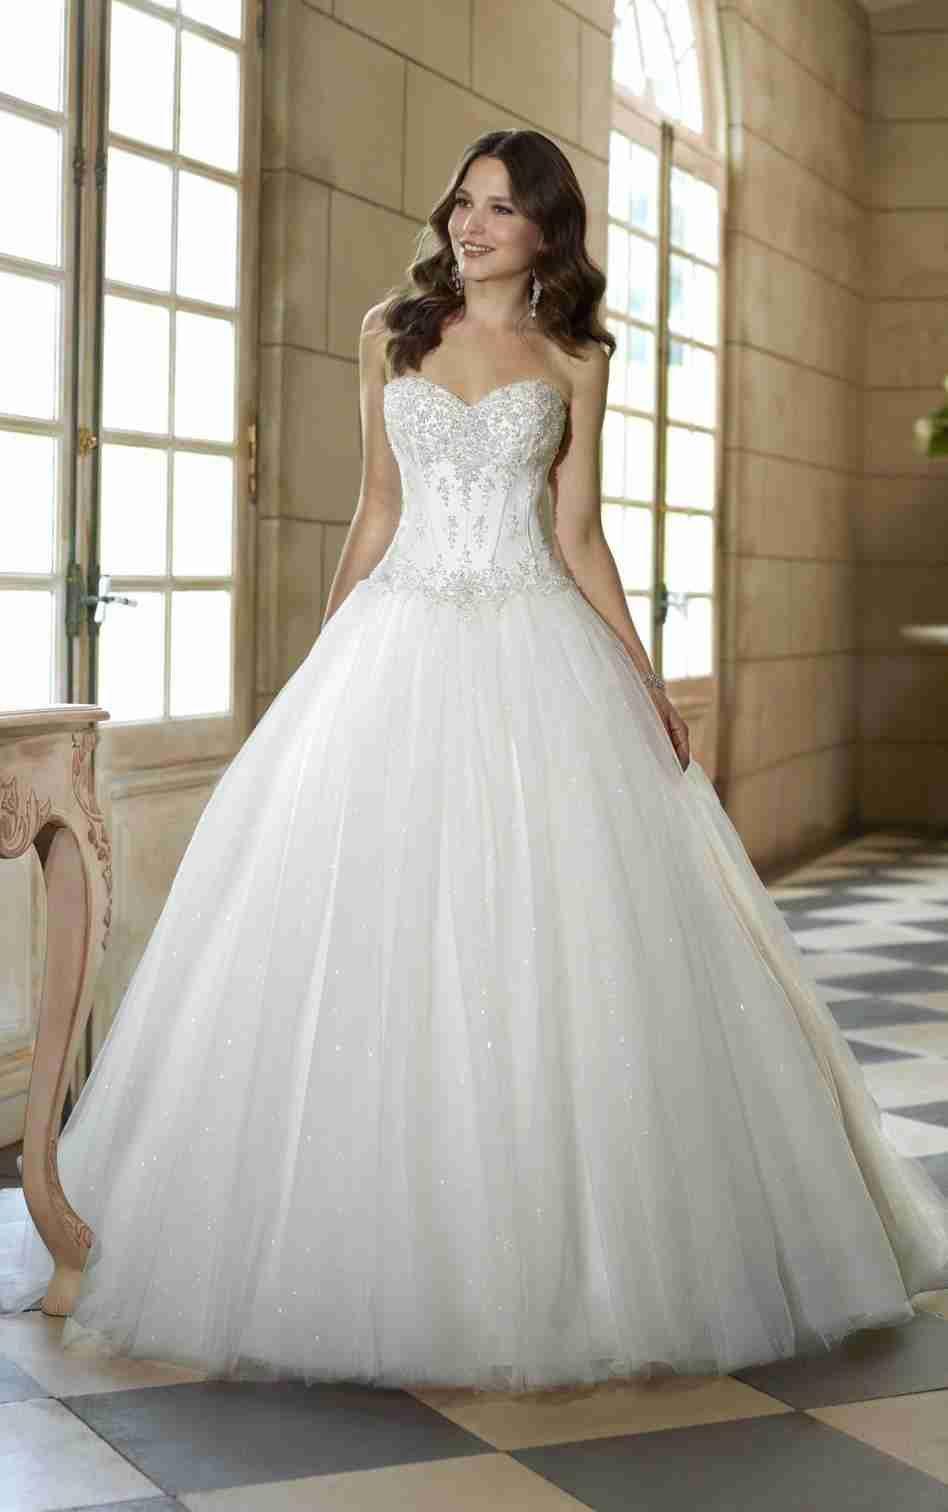 Stunning Bridal Gowns Tumblr Contemporary - Wedding Dress Ideas ...